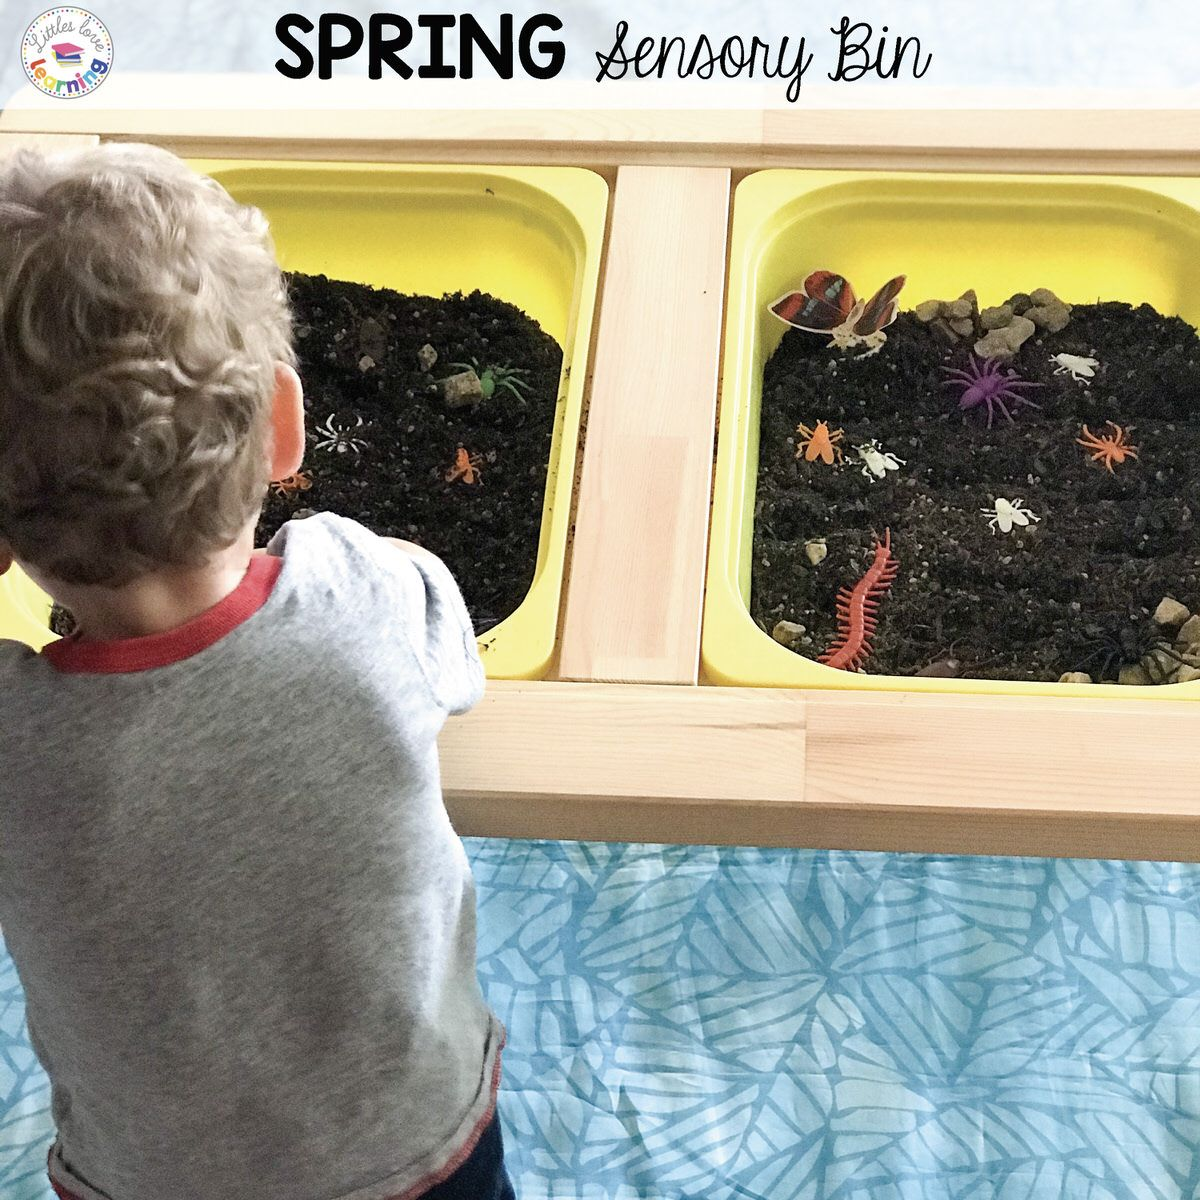 At-Home Learning: Spring Sensory Bin for Kids